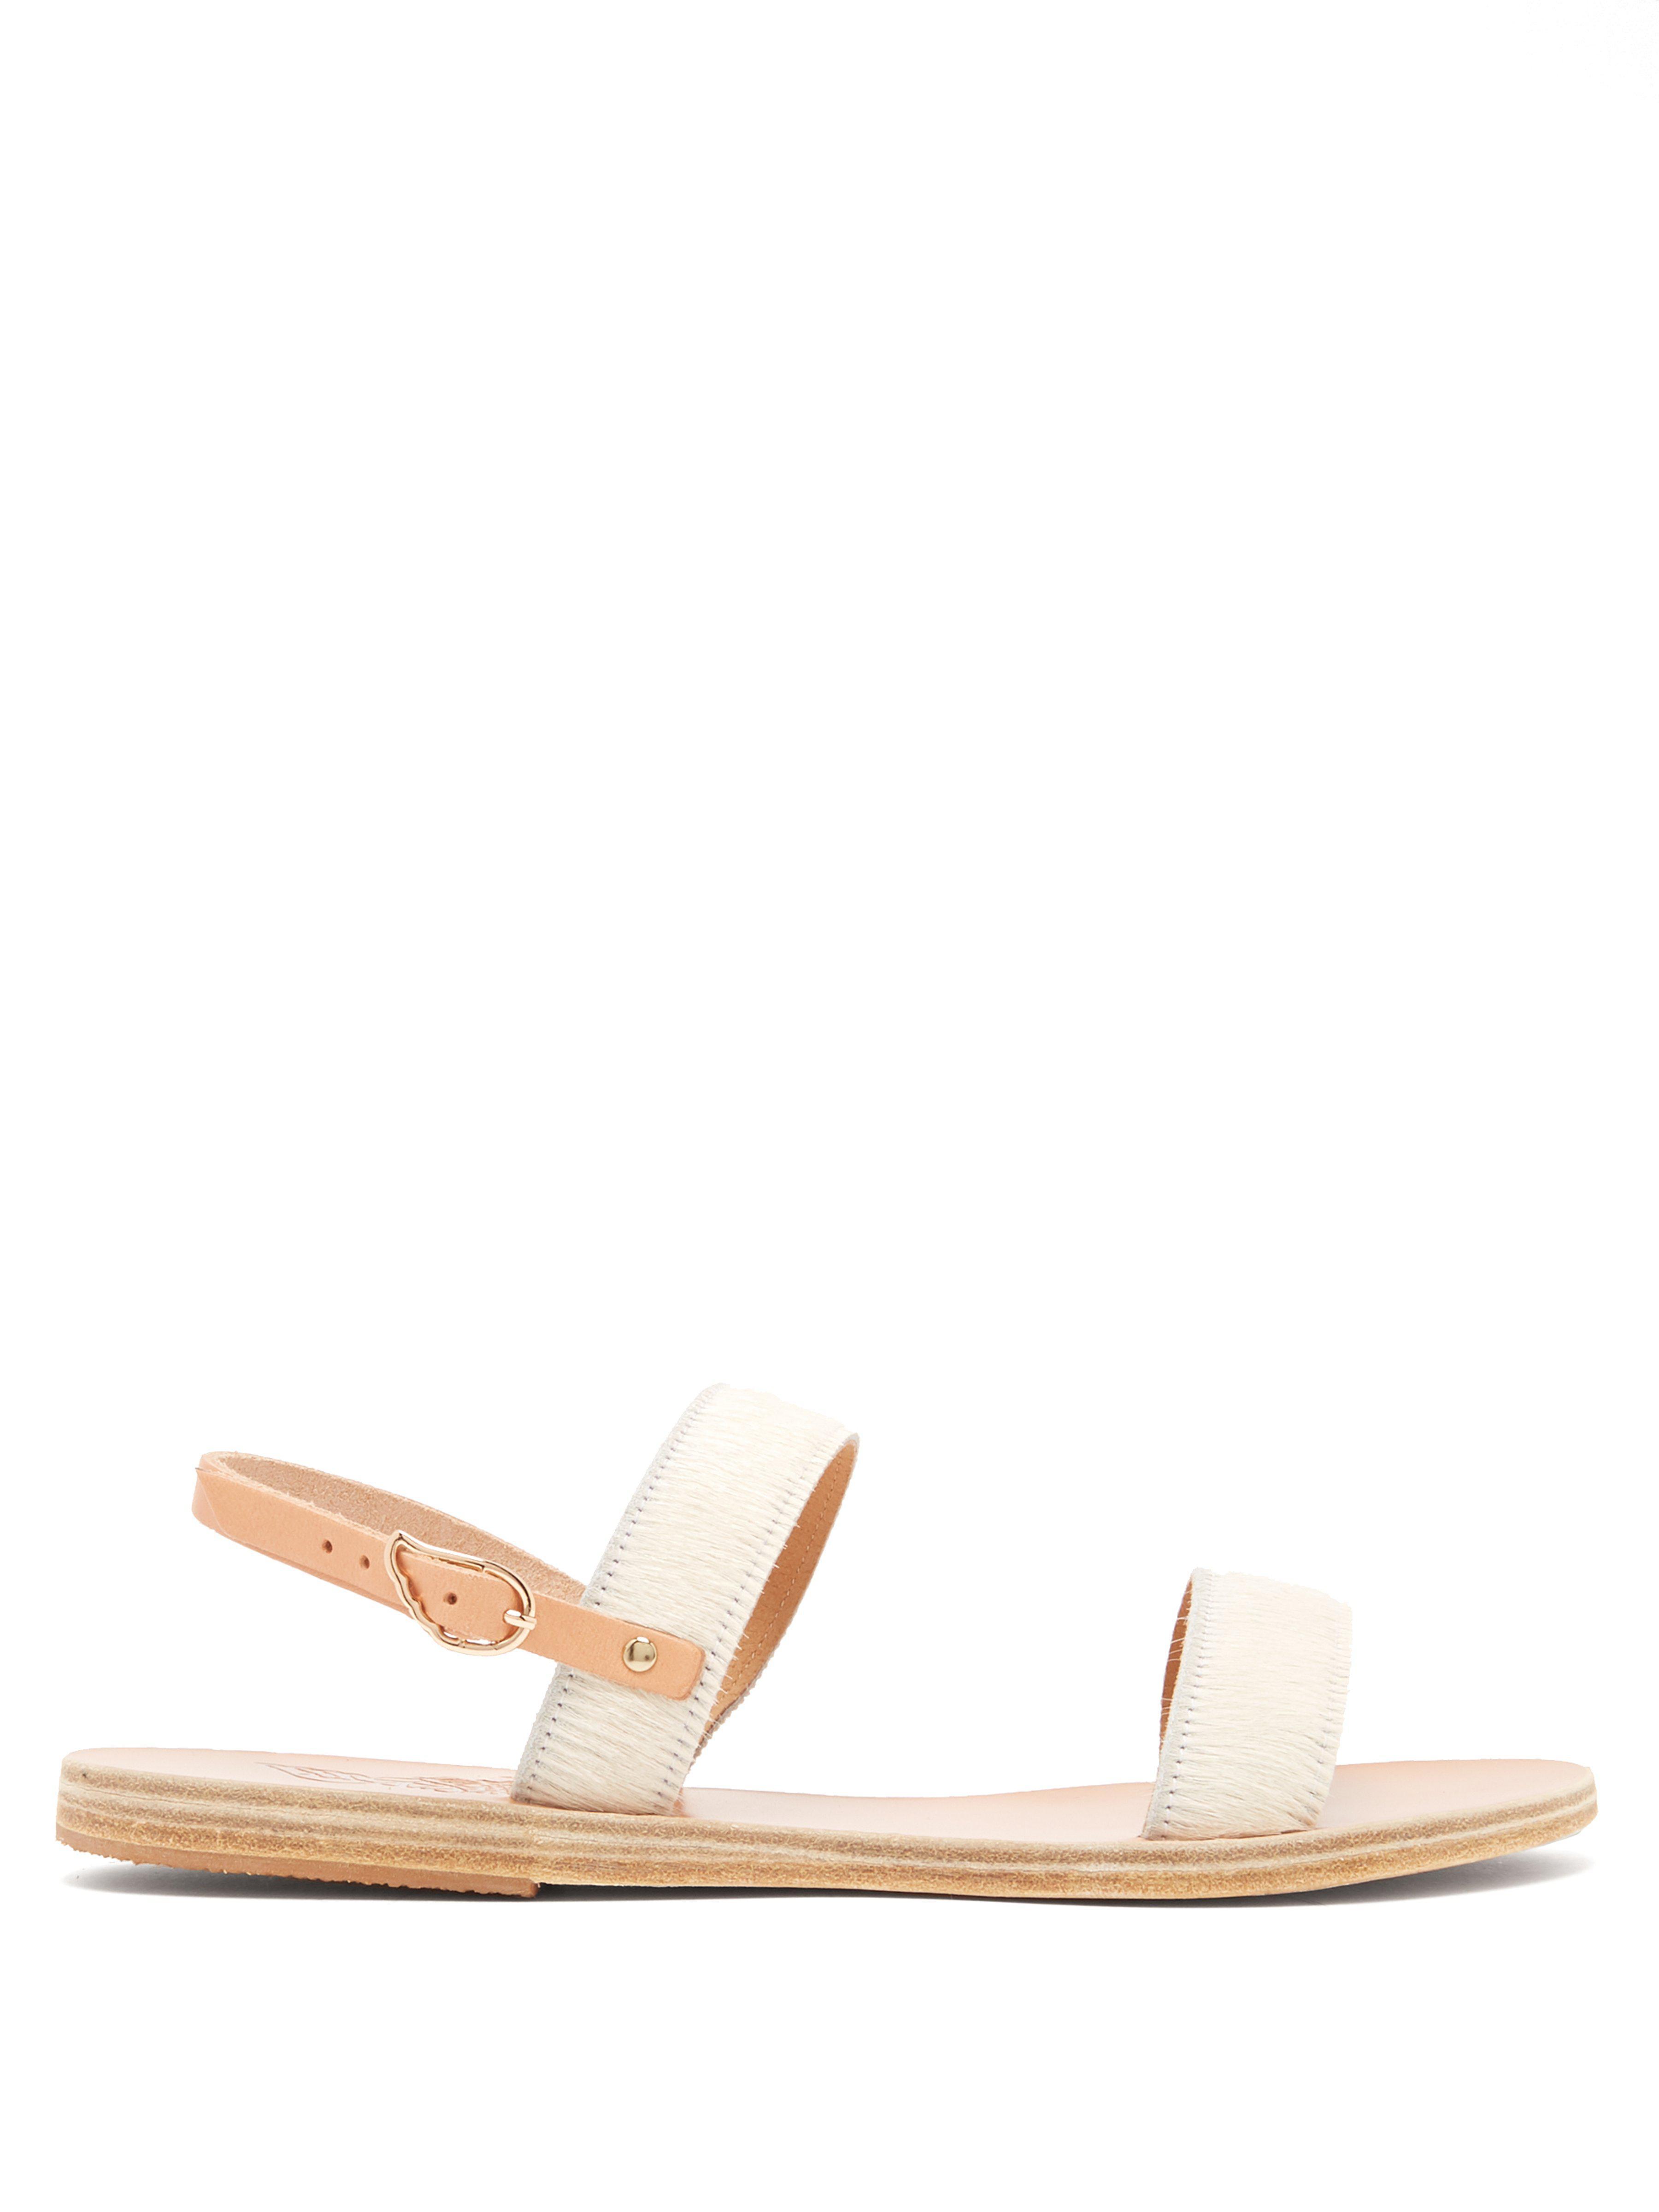 0559be10b3d31 Ancient Greek Sandals Clio Calf Hair Sandals in White - Lyst